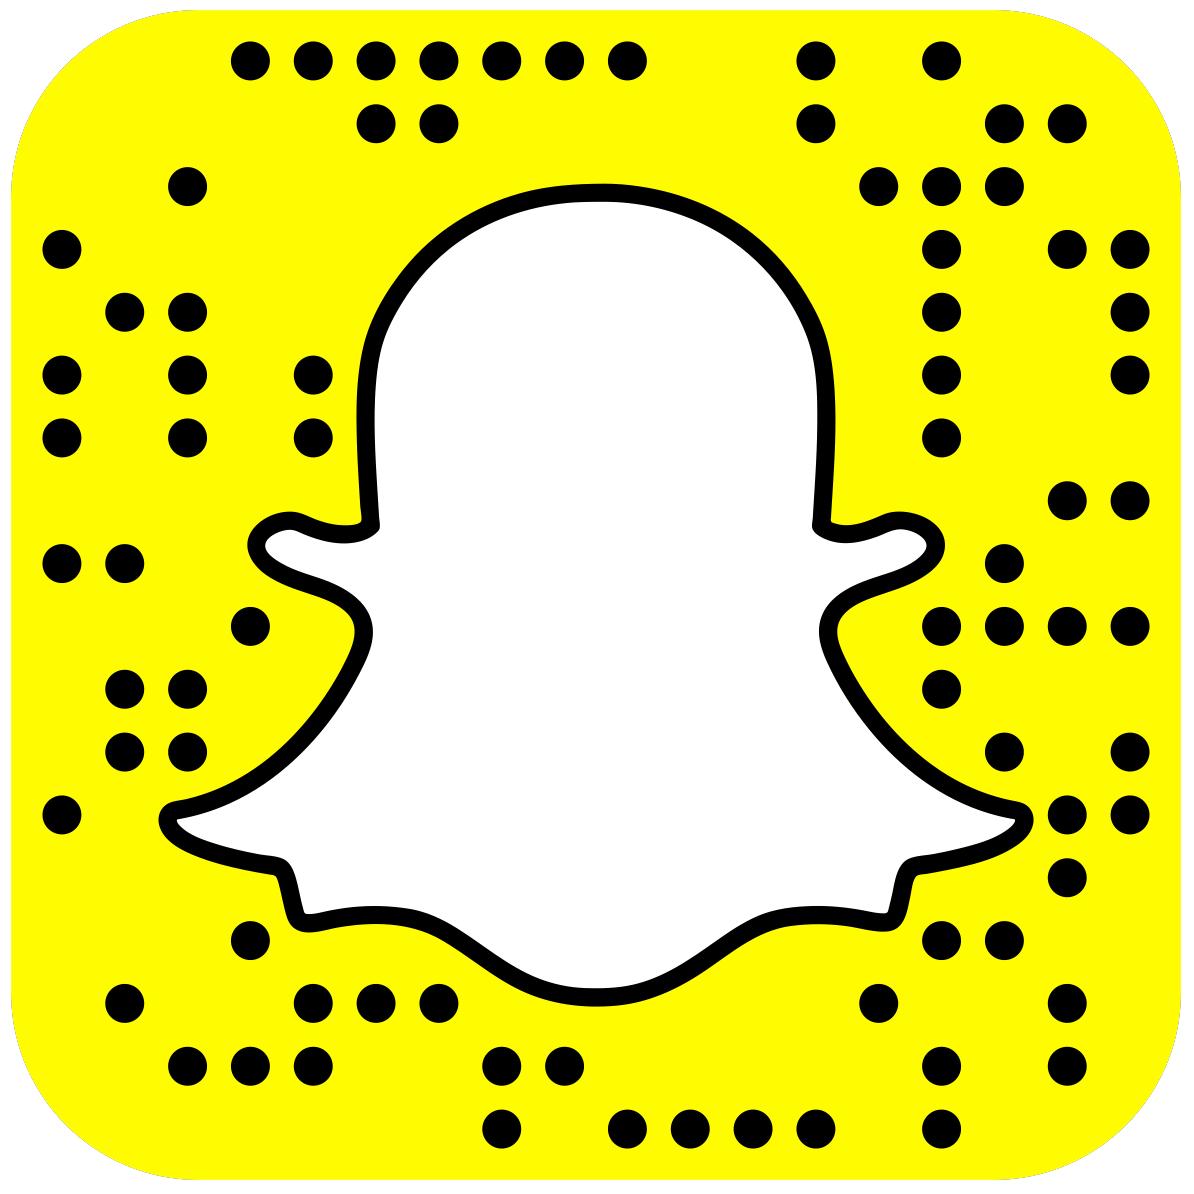 Solenn Heussaff Snapchat username